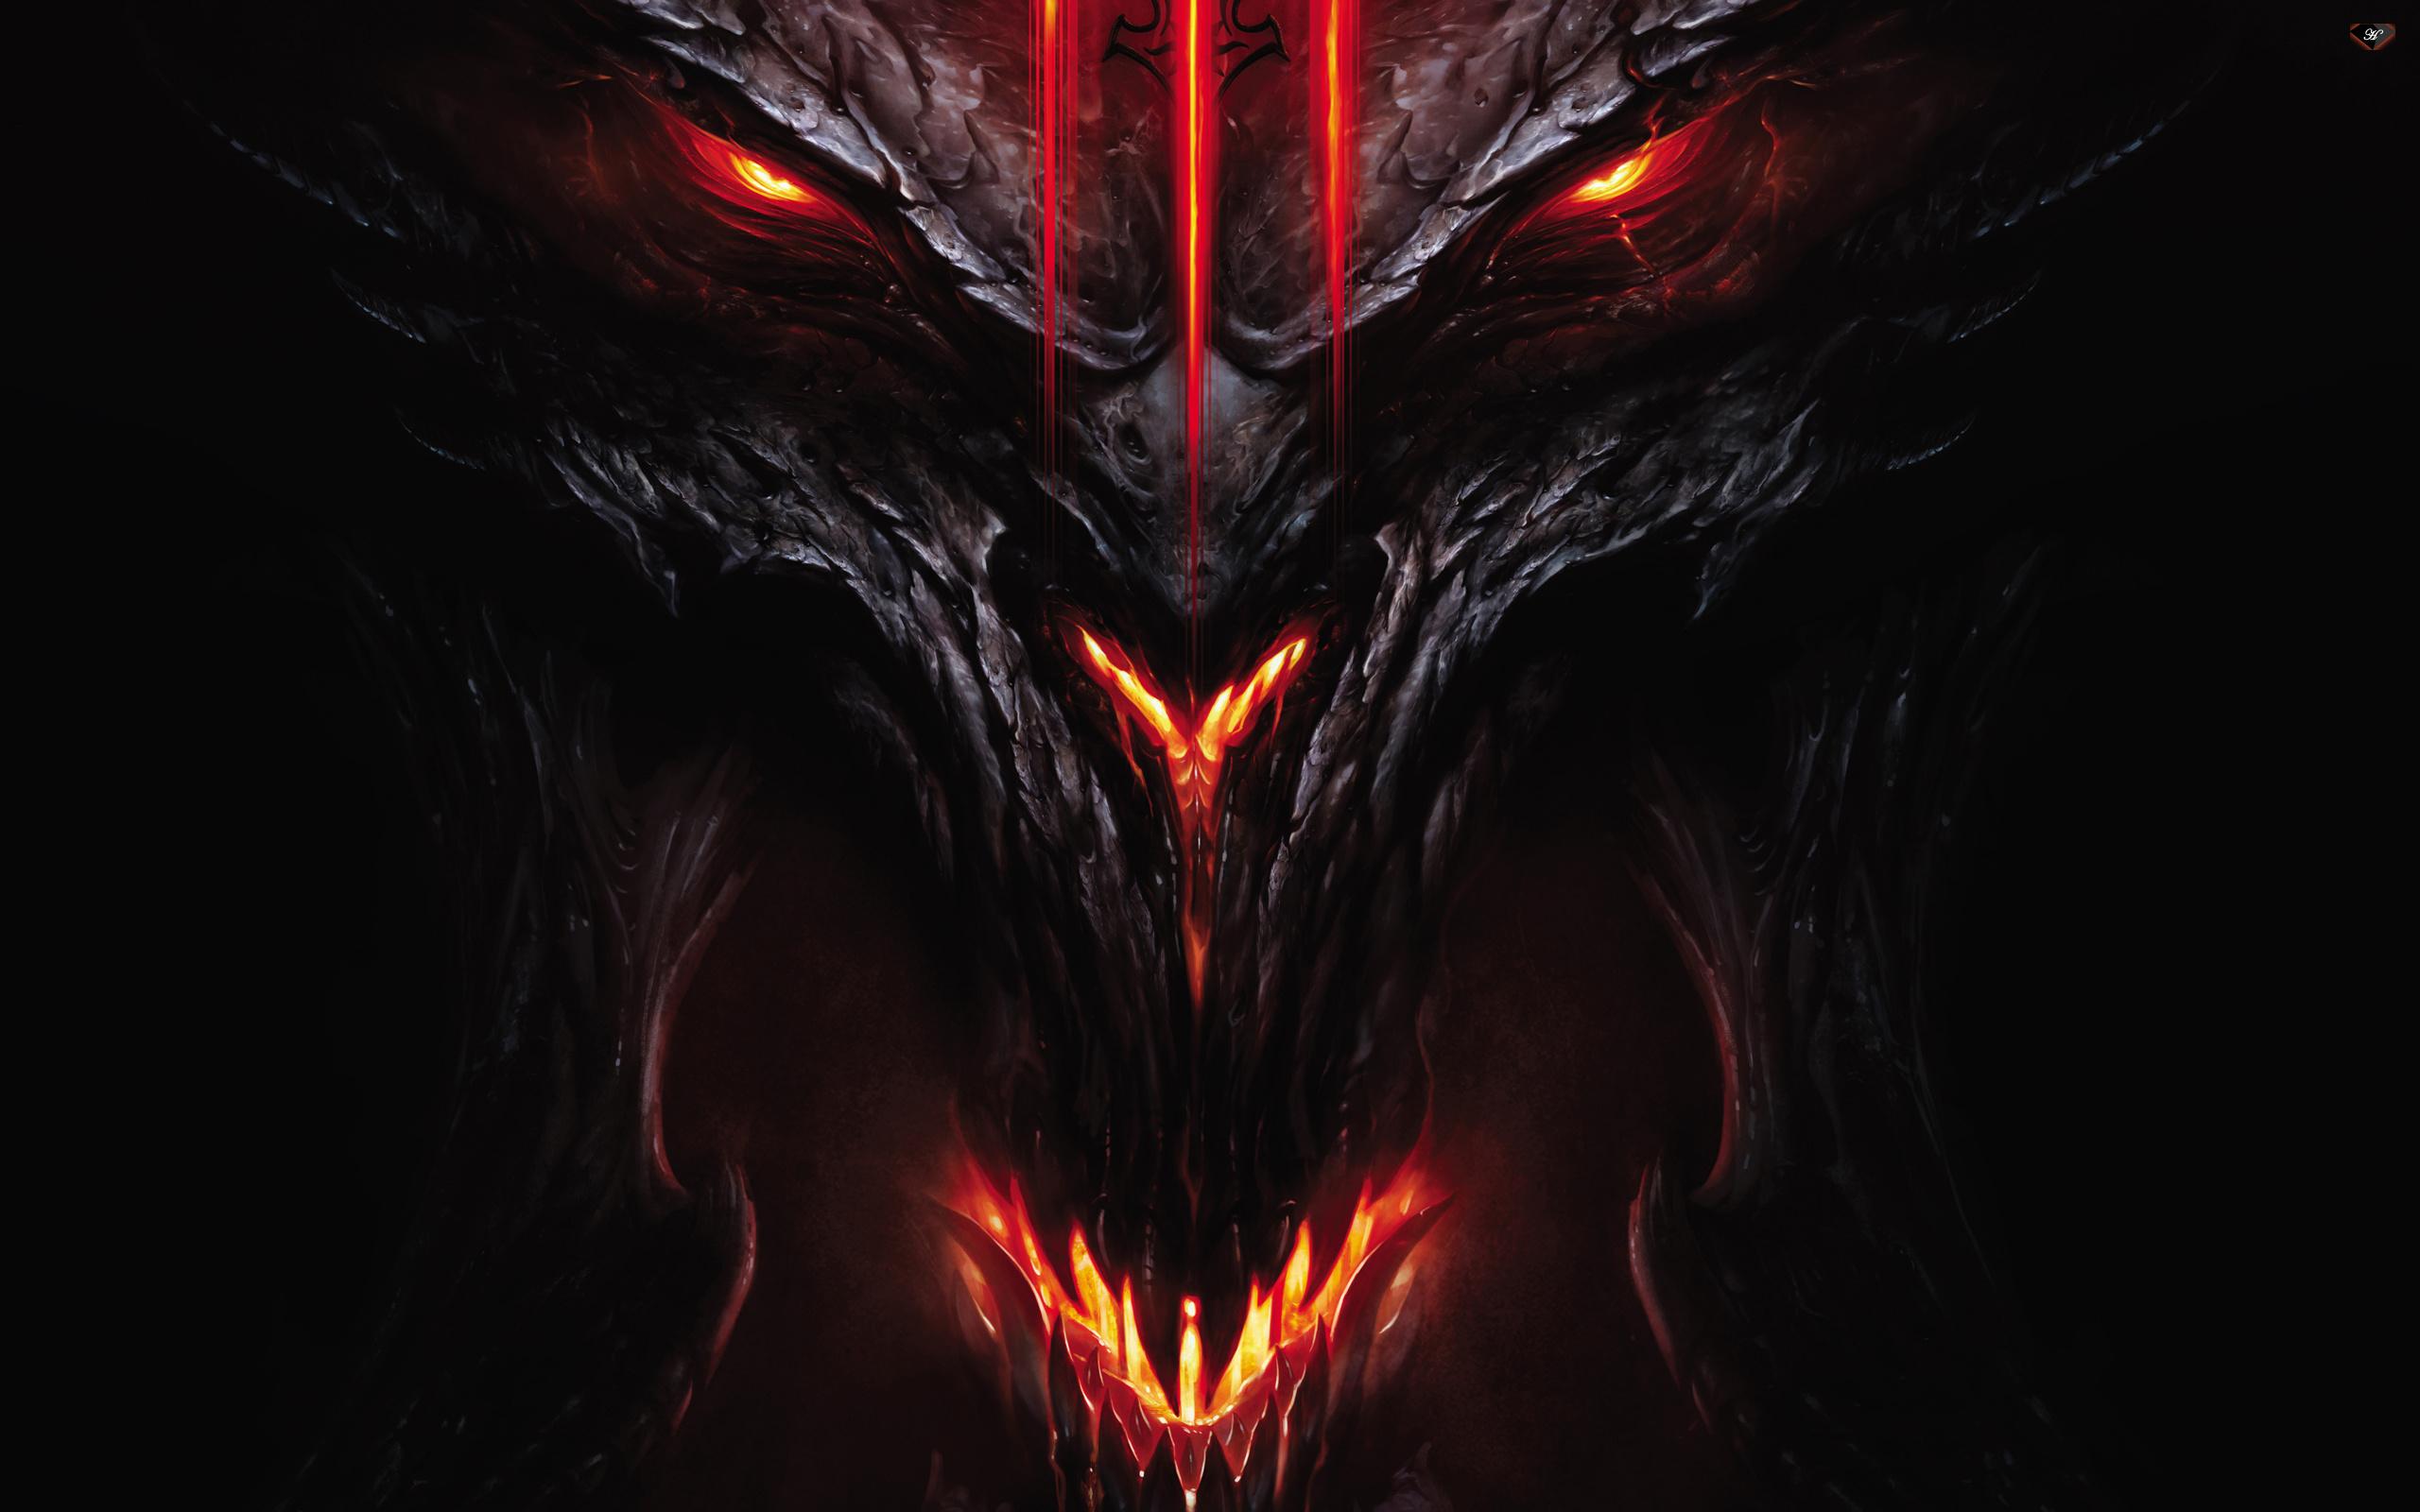 Wallpaper Devil demon Diablo 3 Diablo monster desktop wallpaper 2560x1600